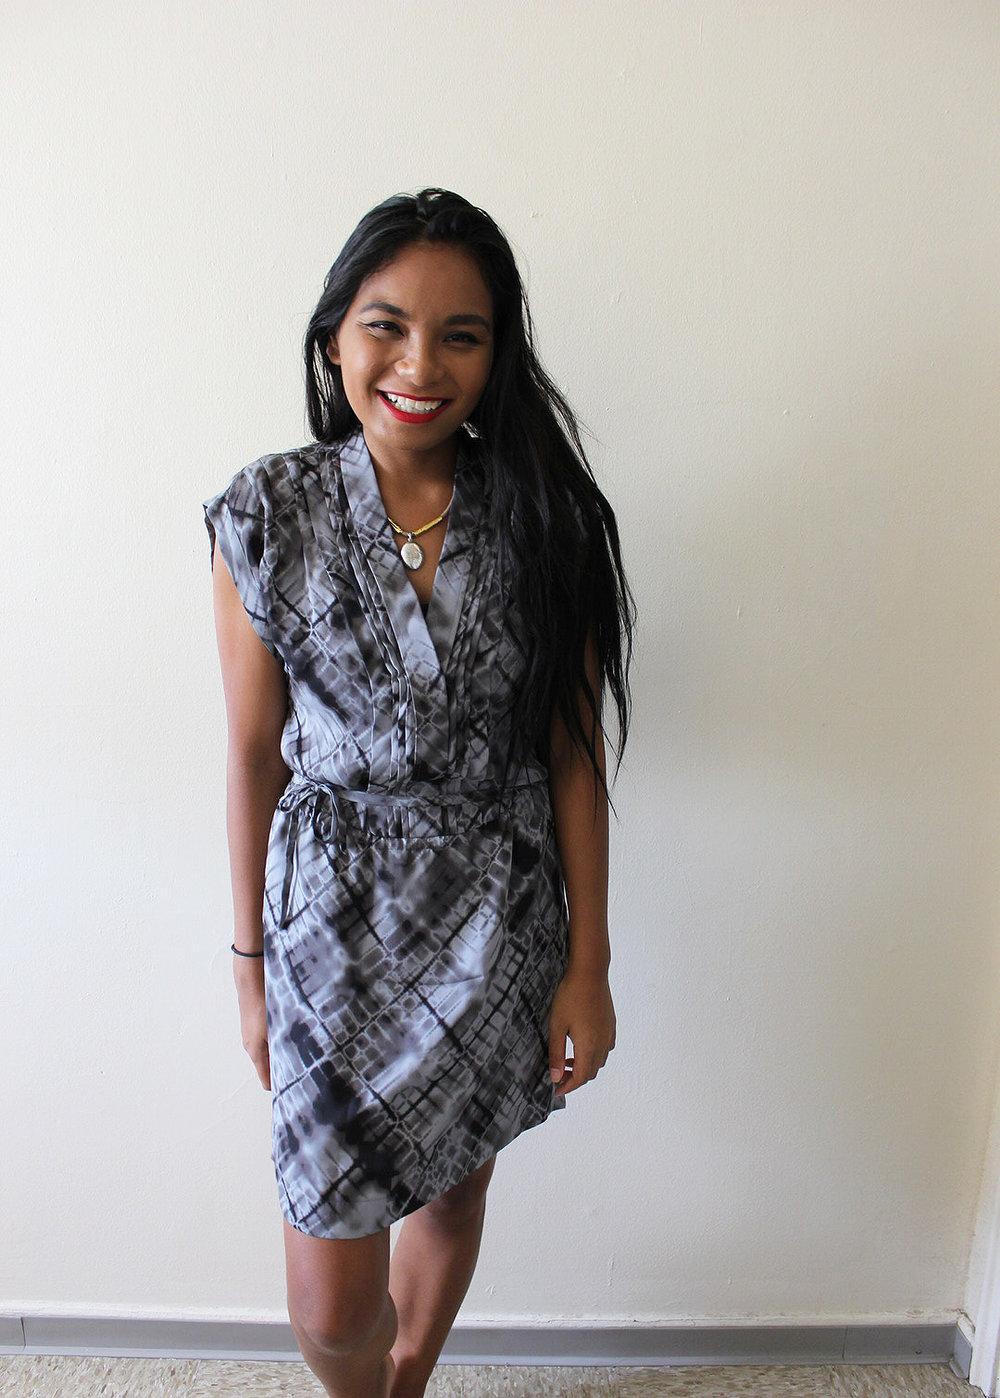 Purple-Gray-Banana-Republic-Dress-Fall-Style-Blogger-Fashionista-LINDATENCHITRAN-2-1616x1080.jpg